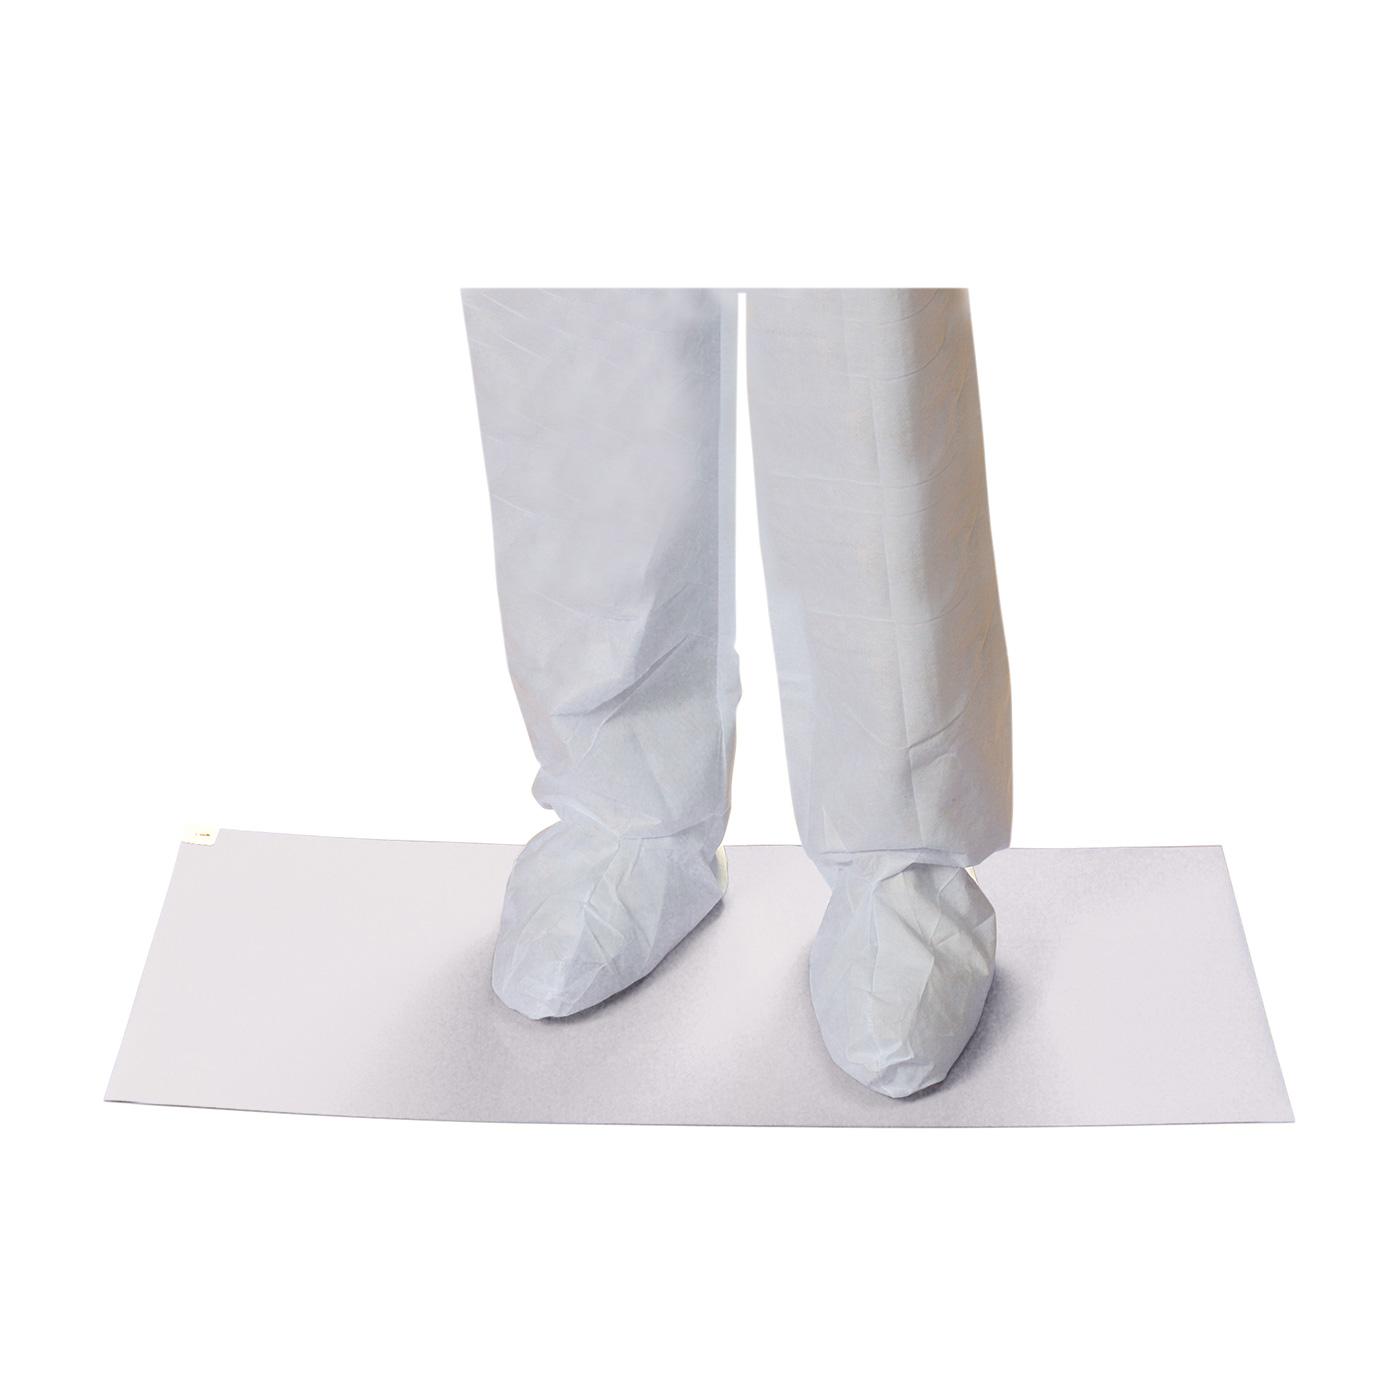 "60-Layer Contamination Control Mat - 26"" x 45"", White, 26"" x 45"""